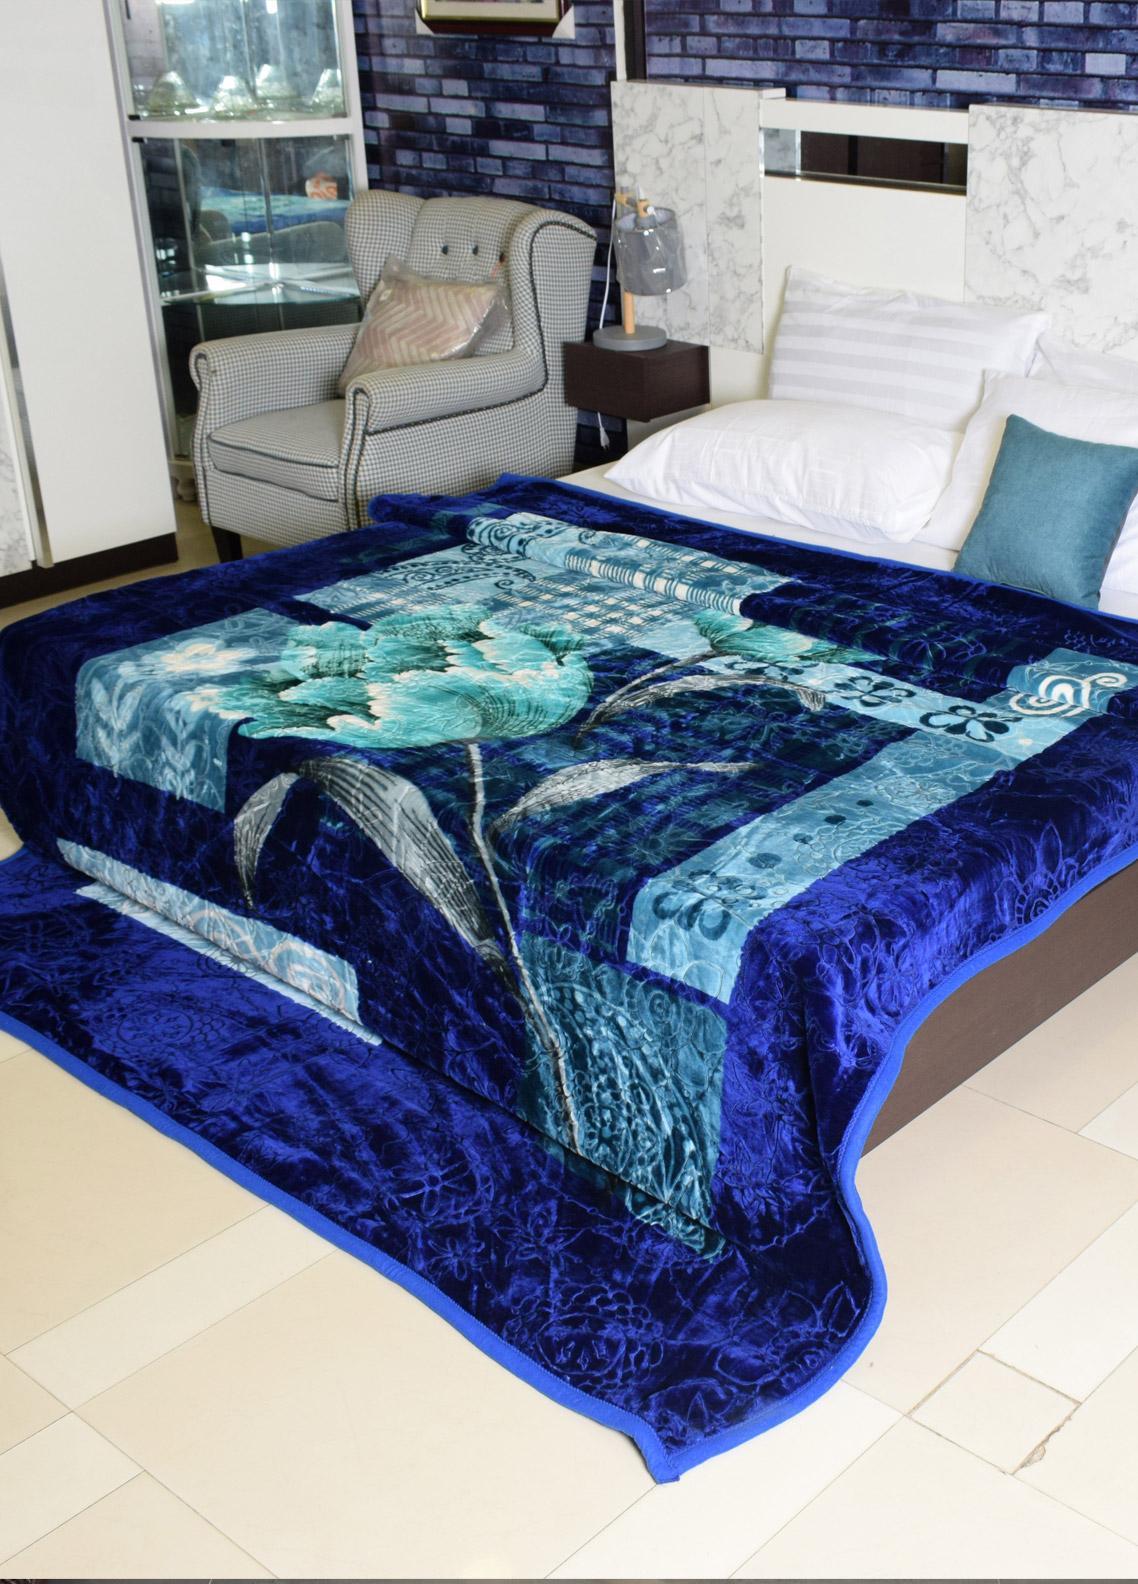 Plush Mink Double Bed Supreme Soft Finish Blankets 2 Ply Purist Korea Double-PK212 - Home & Decor